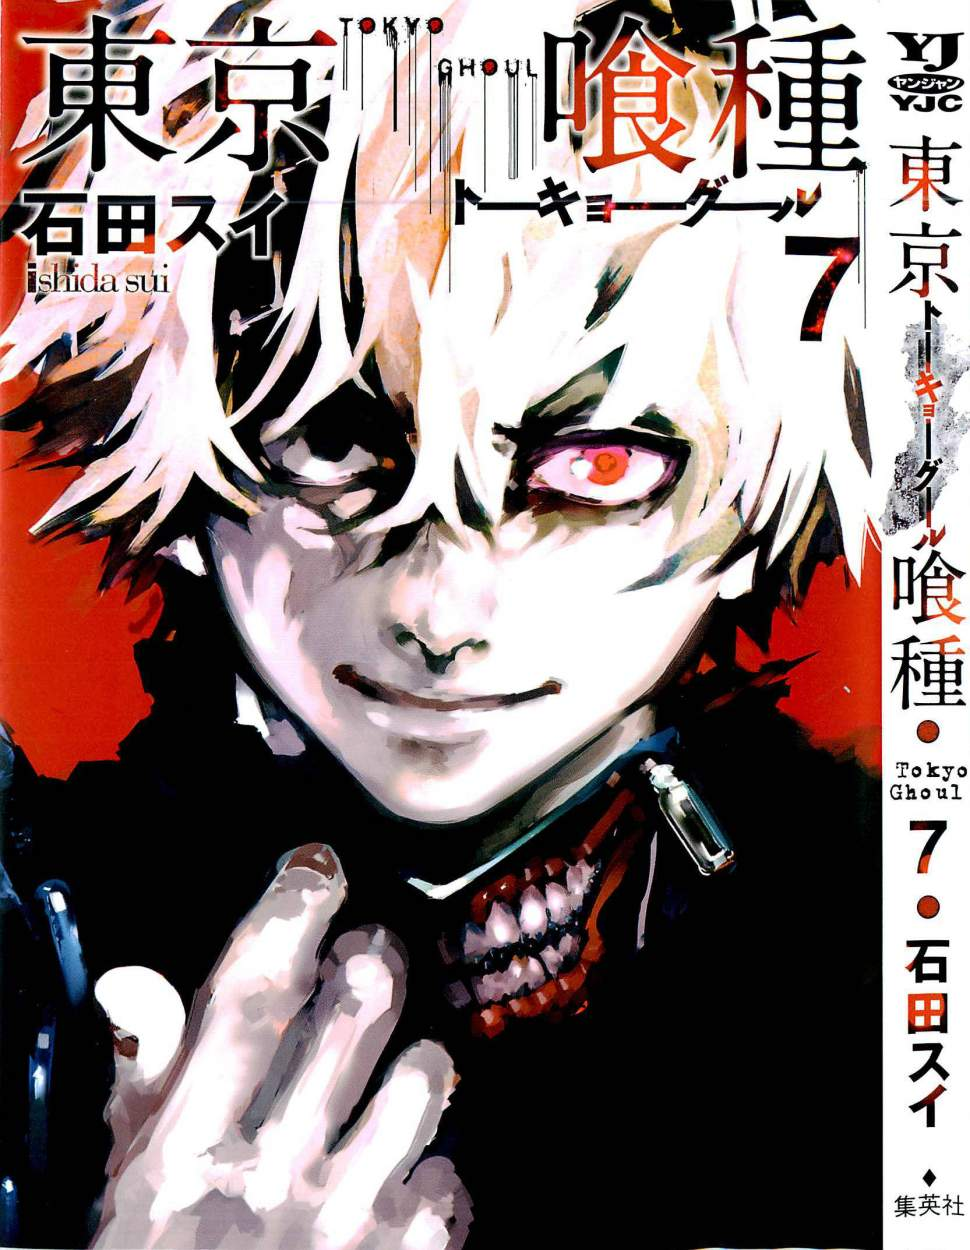 http://c5.ninemanga.com/es_manga/60/60/261790/2dcbd0fd99343ff41ff612c0cca376e0.jpg Page 3